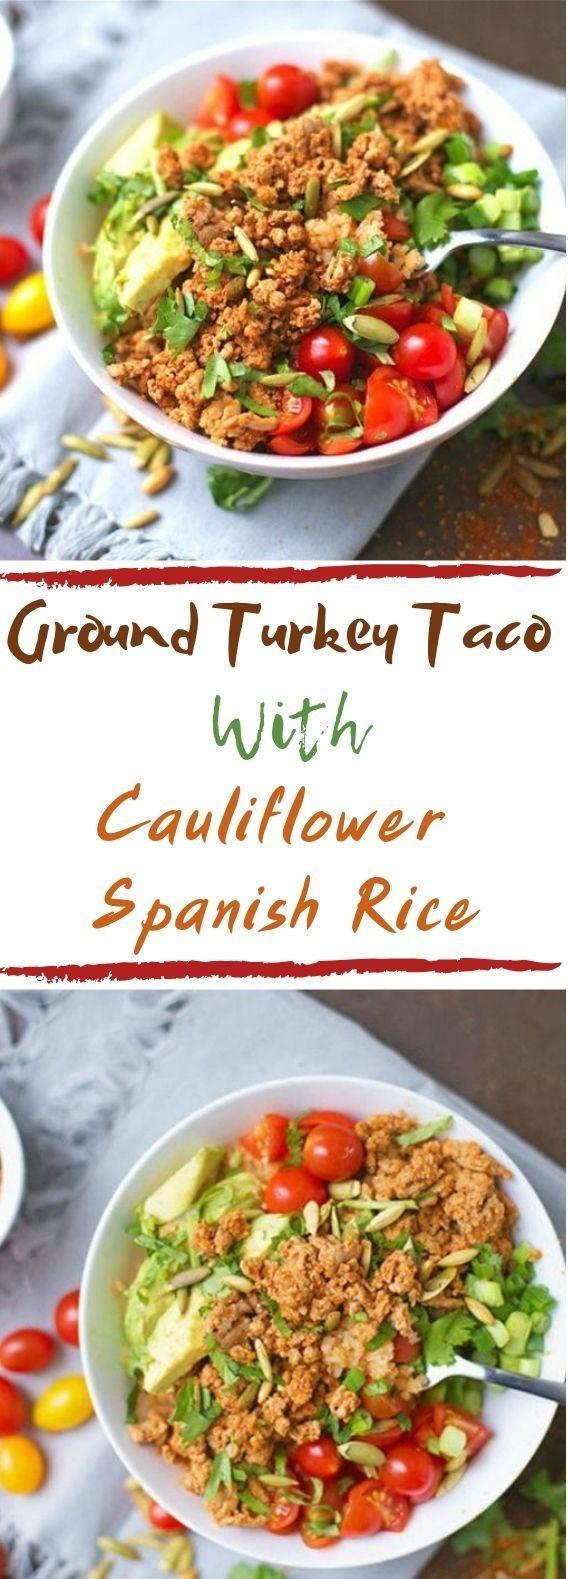 Ground Turkey Taco Bowls With Cauliflower Spanish Rice #healthy #lowcarb   - Hea...   - Rice Recipes - #Bowls #Cauliflower #Ground #Hea #HEALTHY #LowCarb #Recipes #Rice #Spanish #Taco #turkey #groundturkeytacos